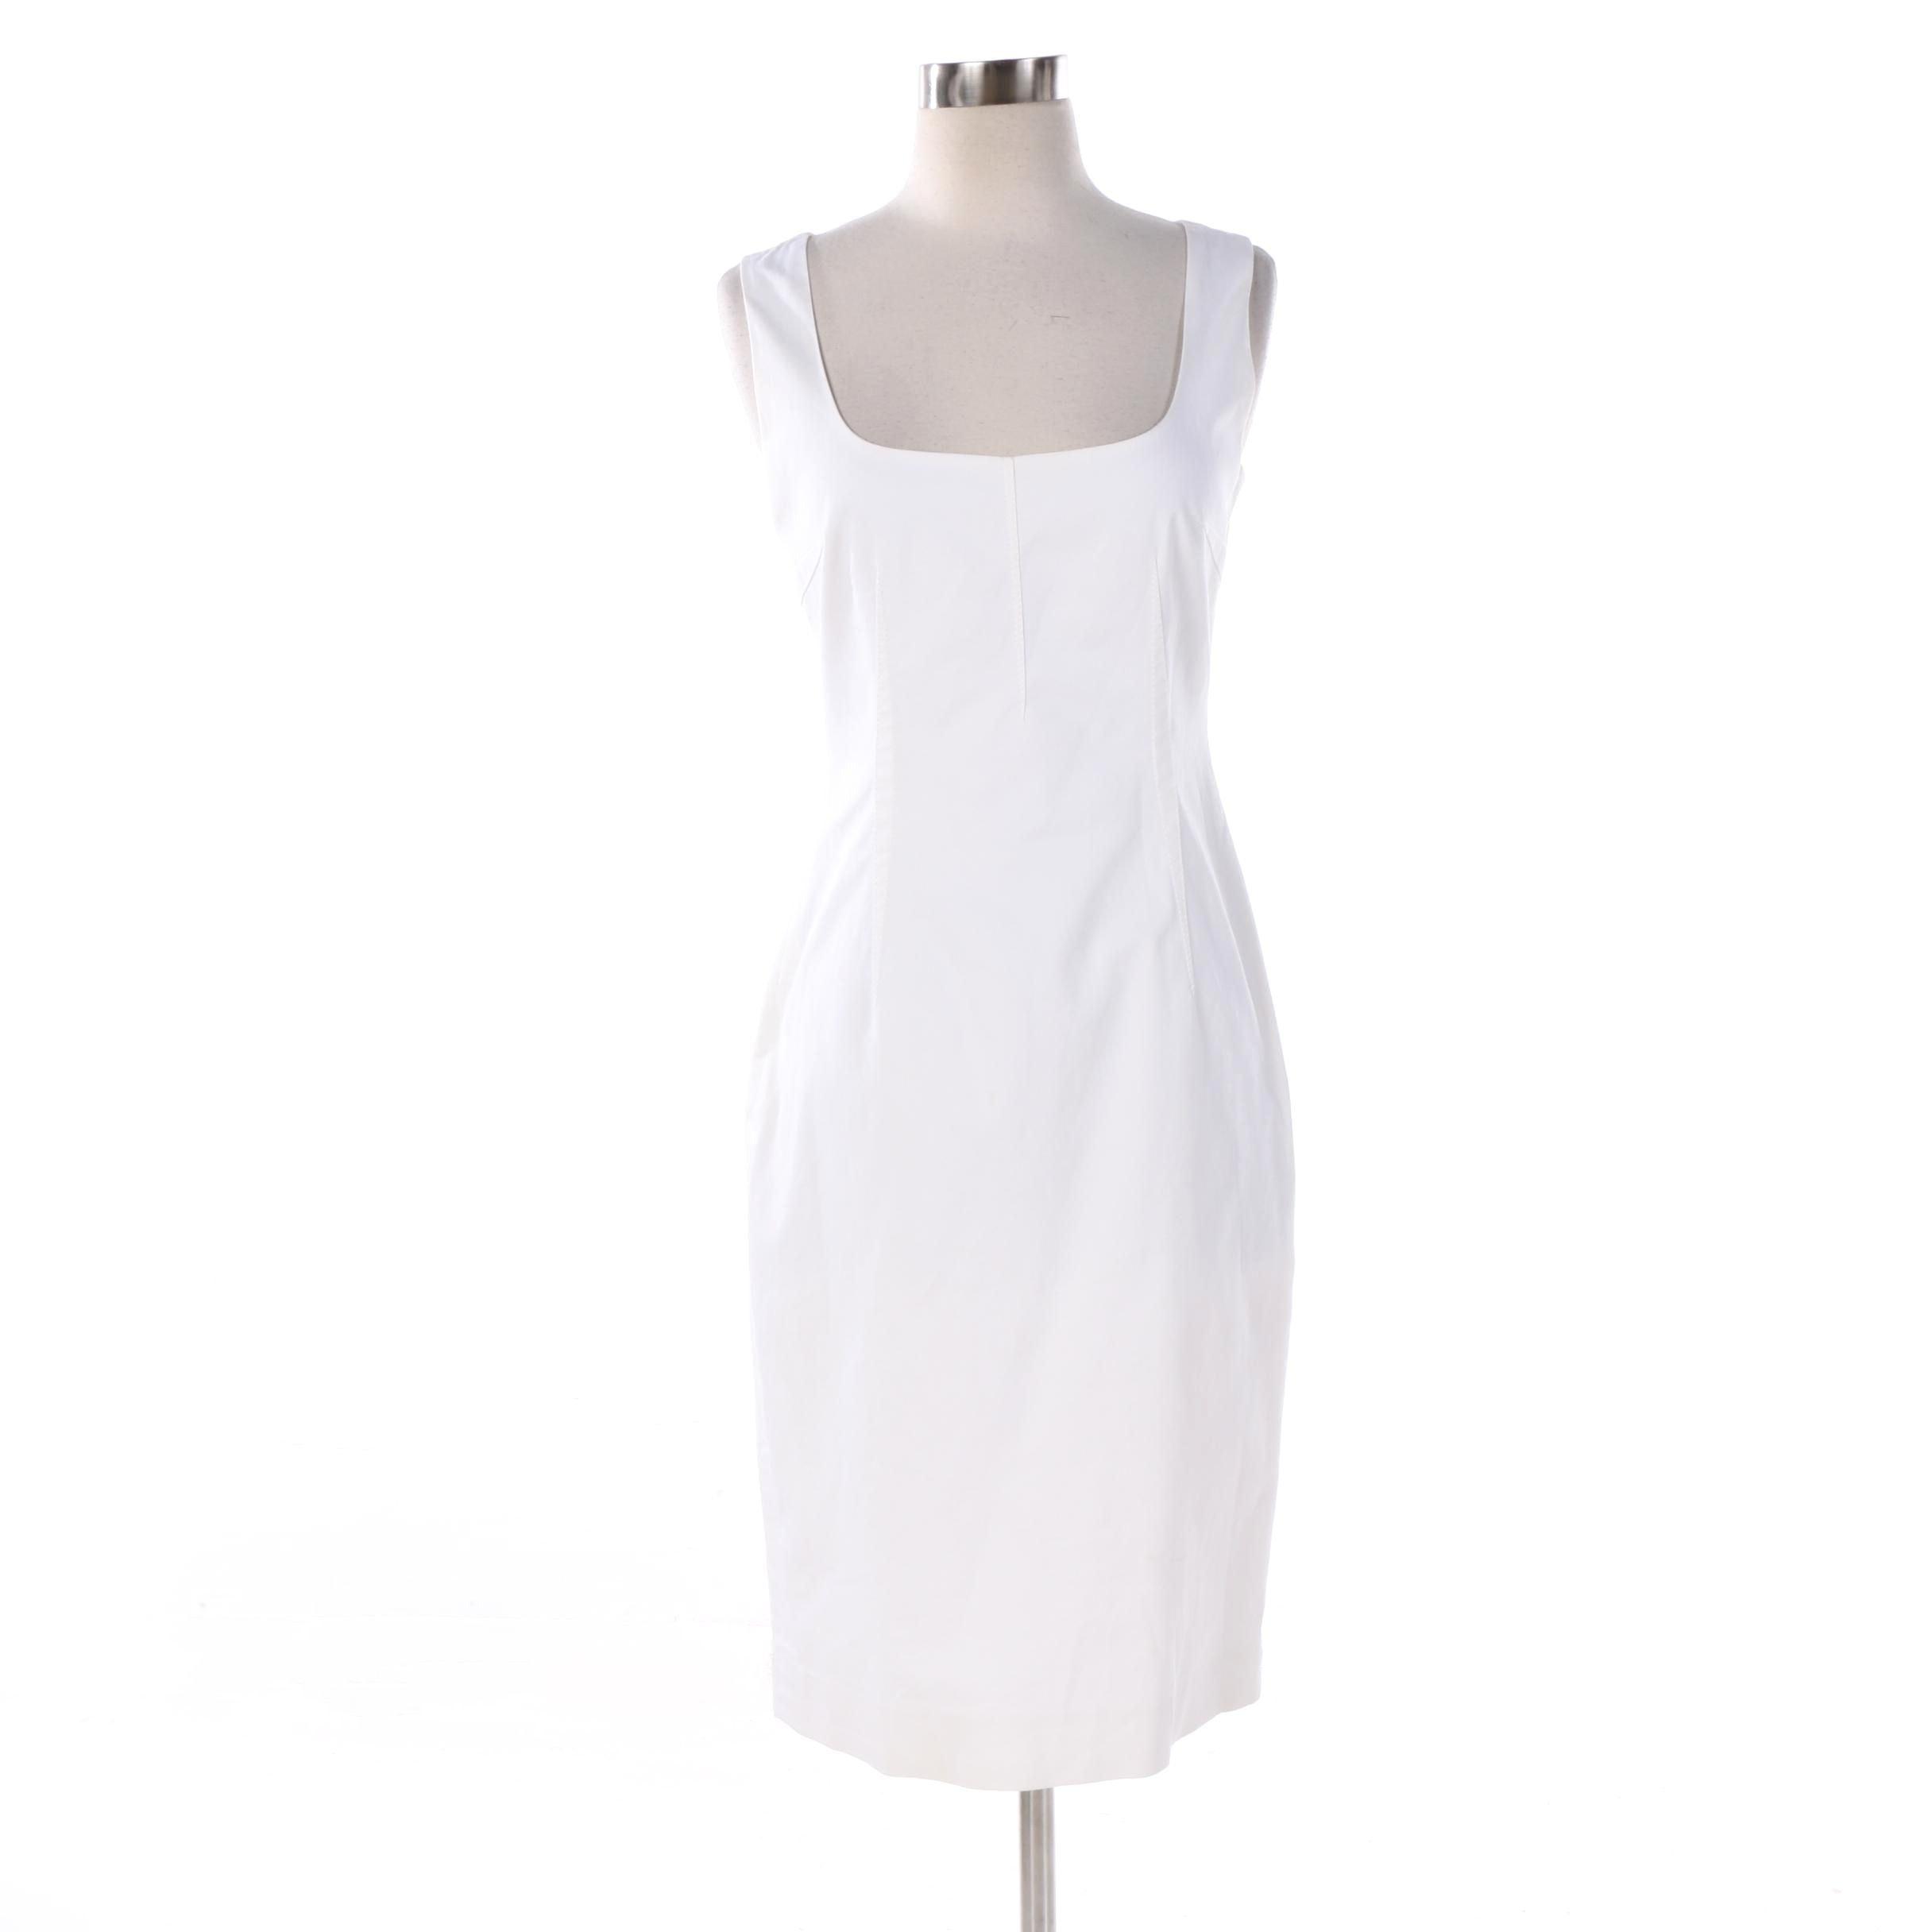 Dolce & Gabbana White Sleeveless Sheath Dress